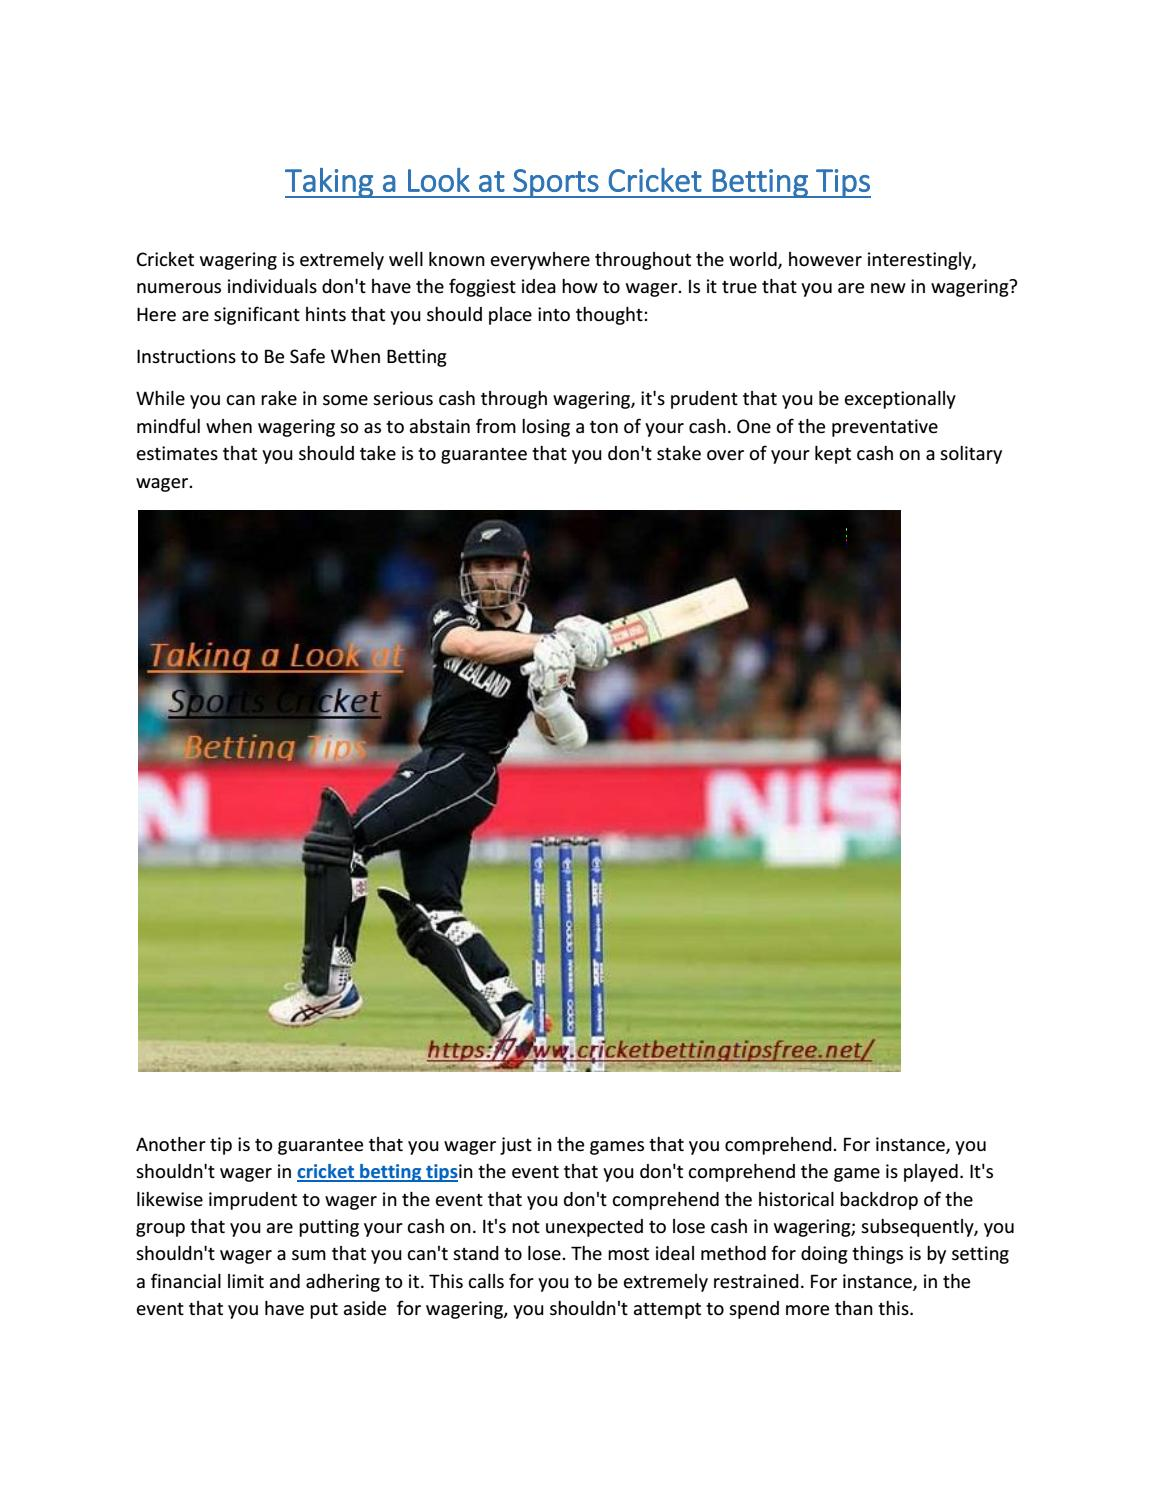 Cricketbettingtipsfree safe anti martingale betting system